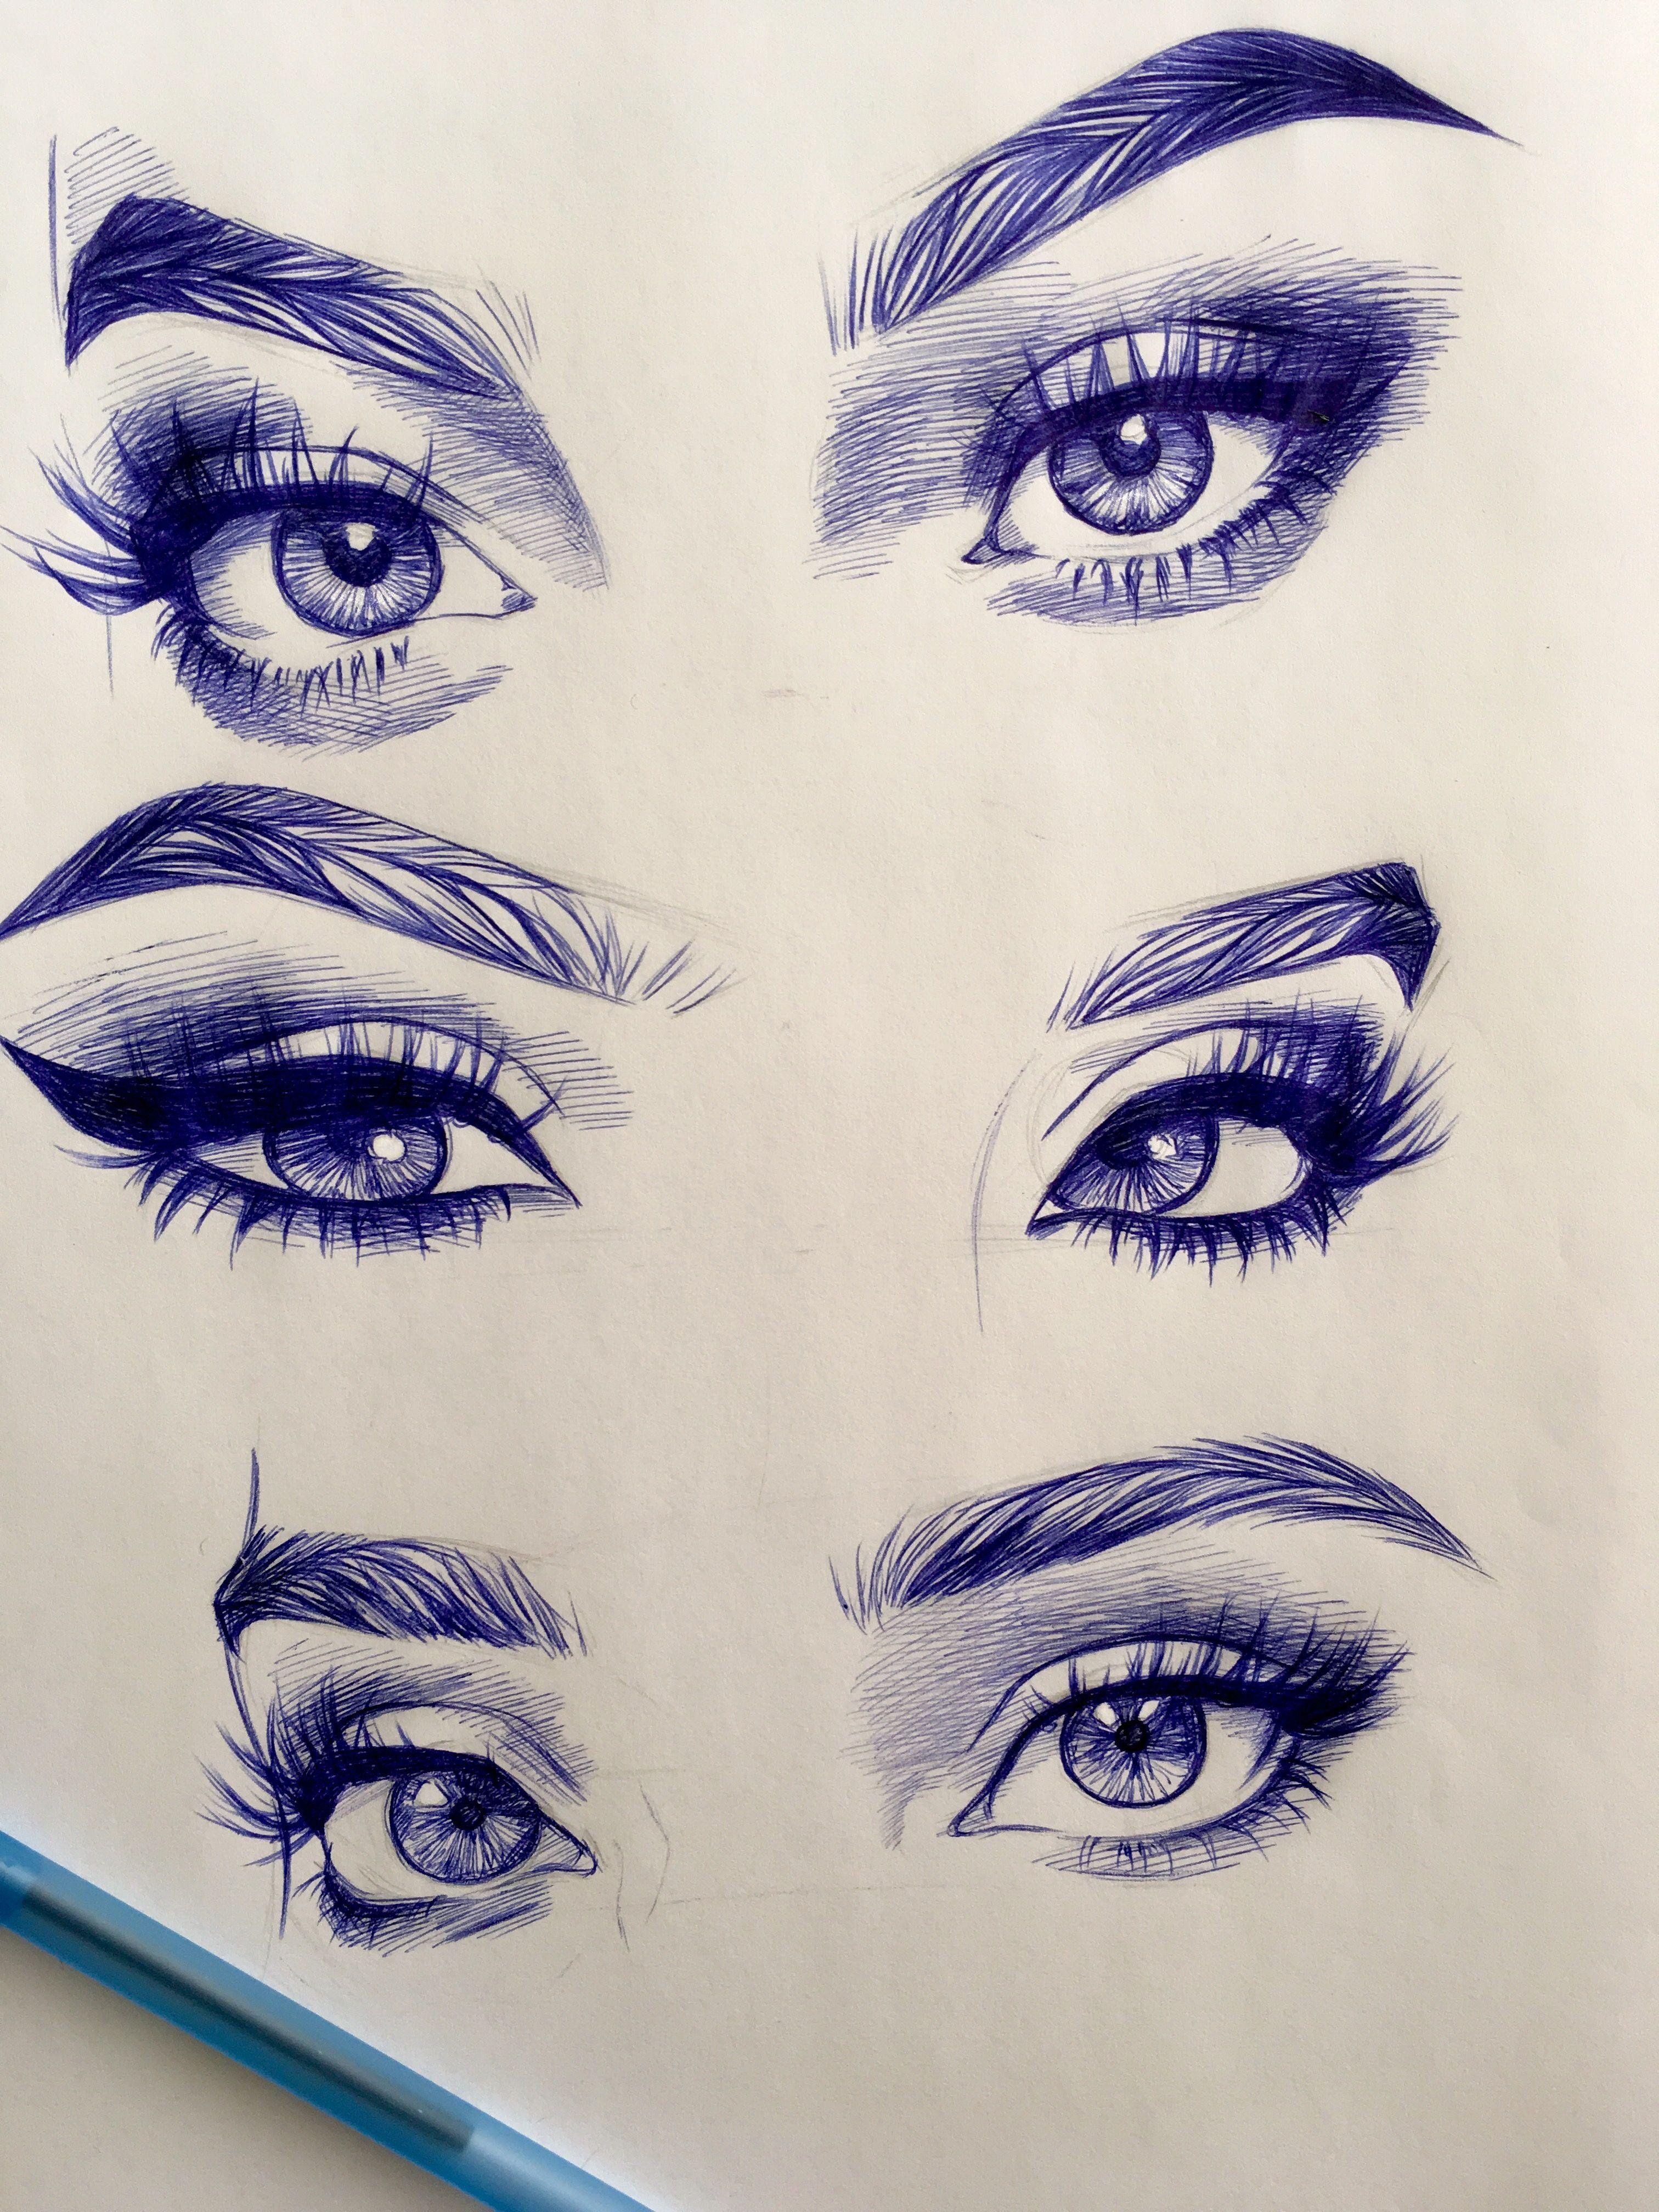 Drawing Eyes Sketch Makeup Art Eyelashes Easy Beginners Eyelashes